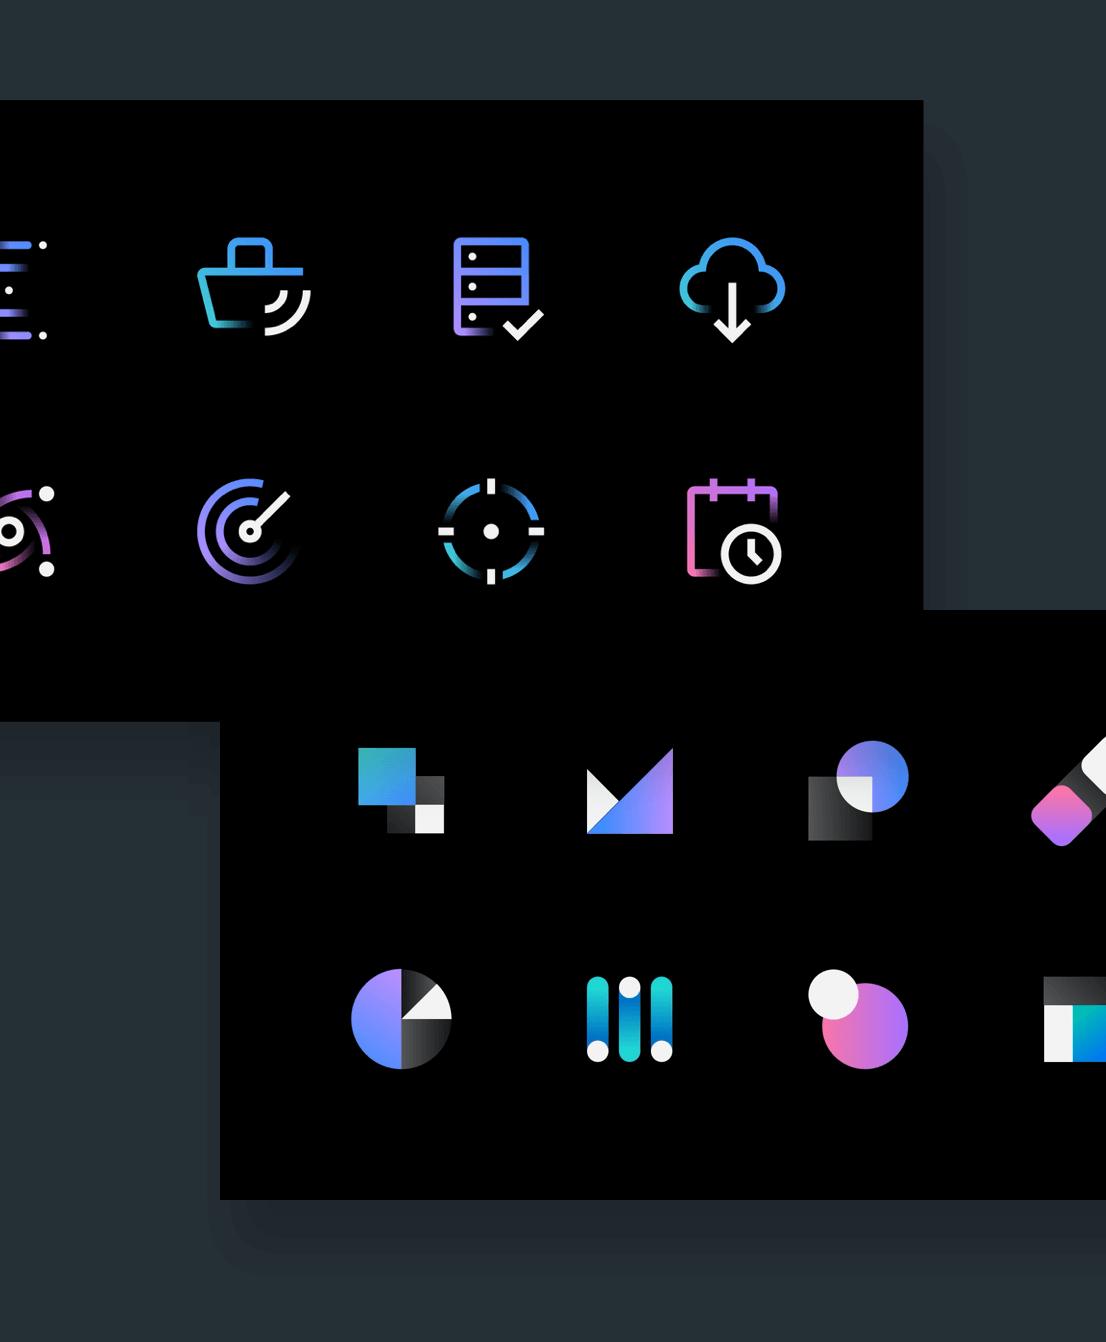 A set of IBM icons and symbols